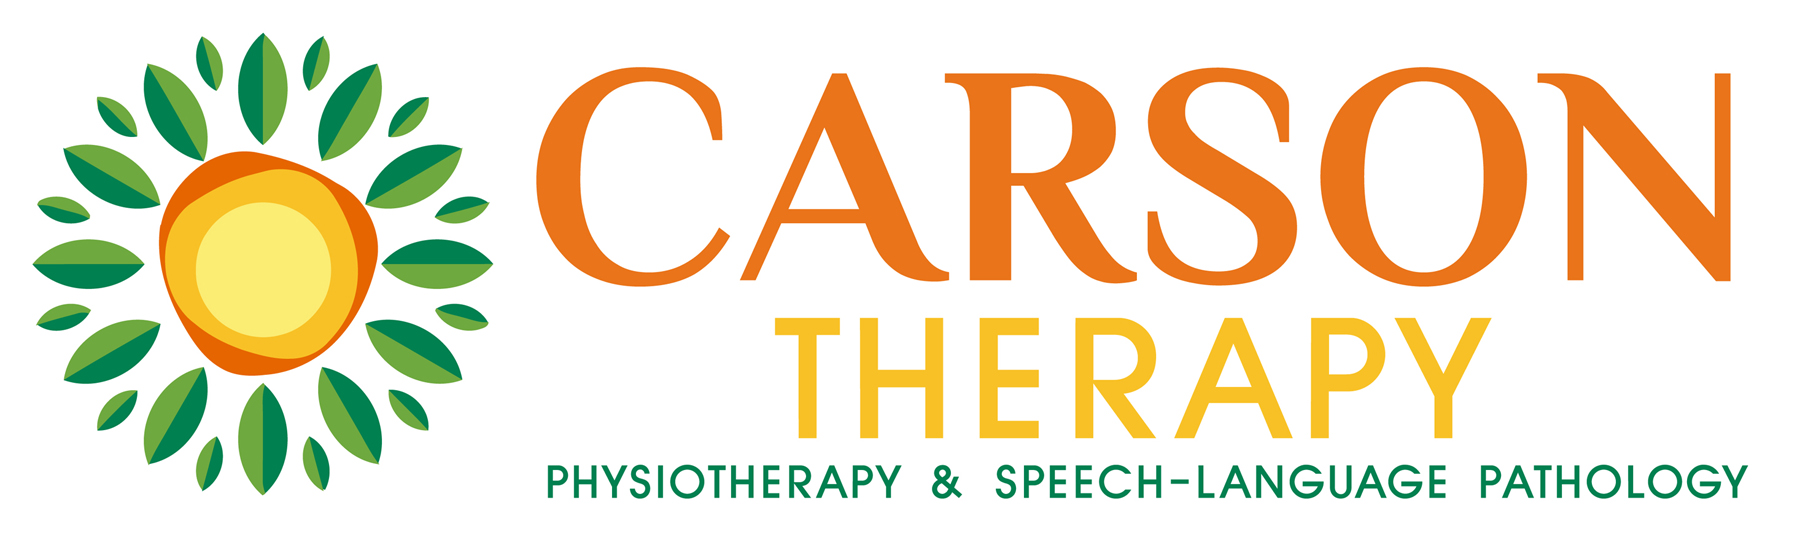 Carson Therapy logo